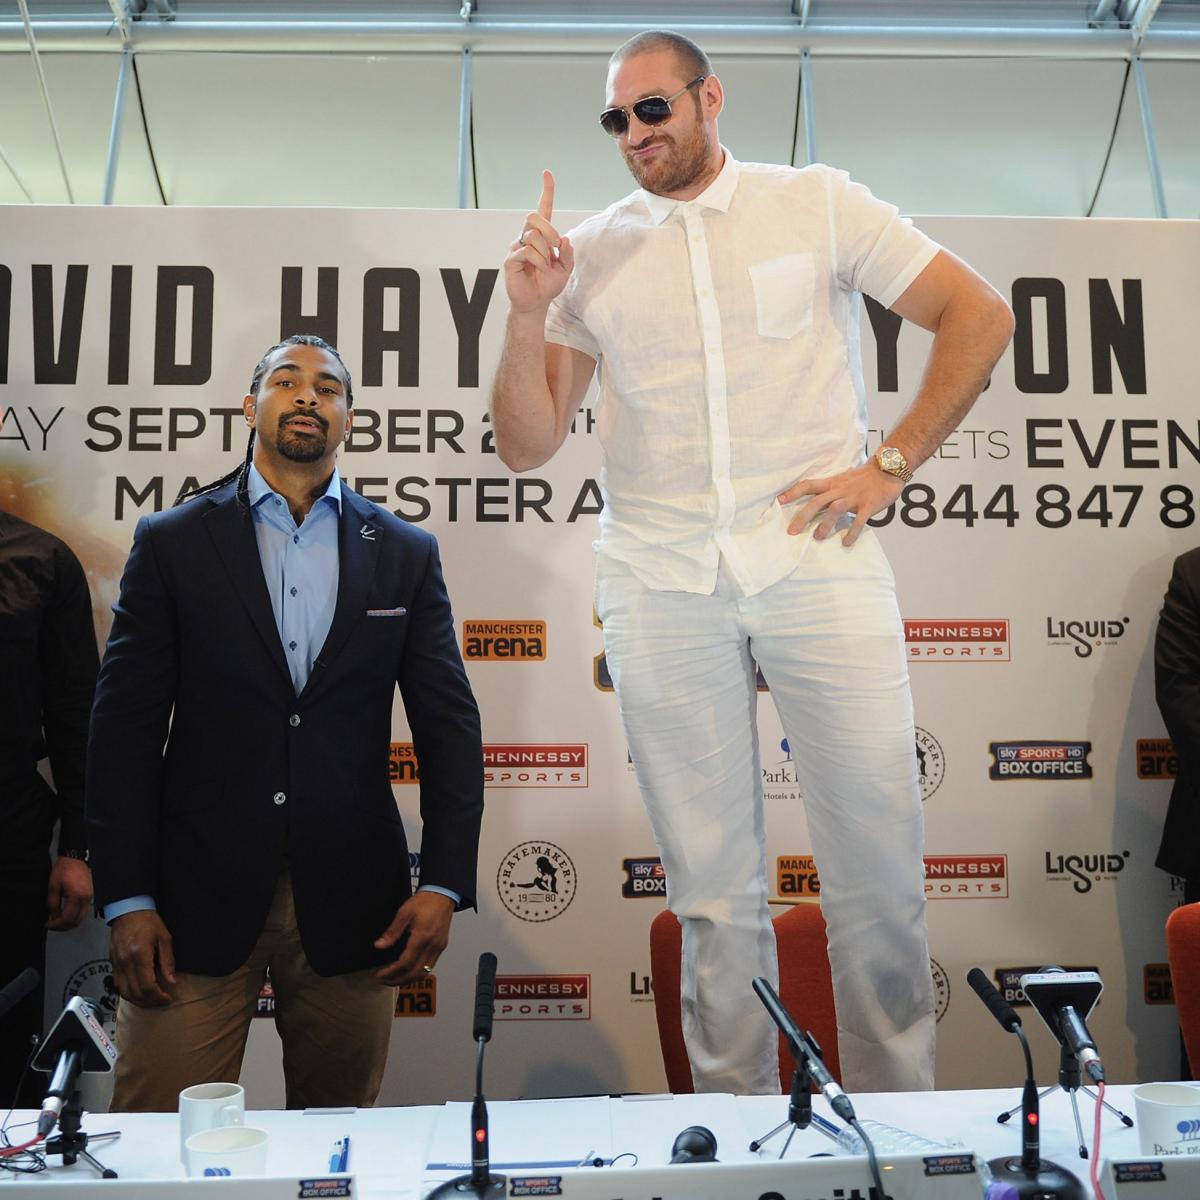 Tyson Fury Slams David Haye, Calls Out Wladimir Klitschko